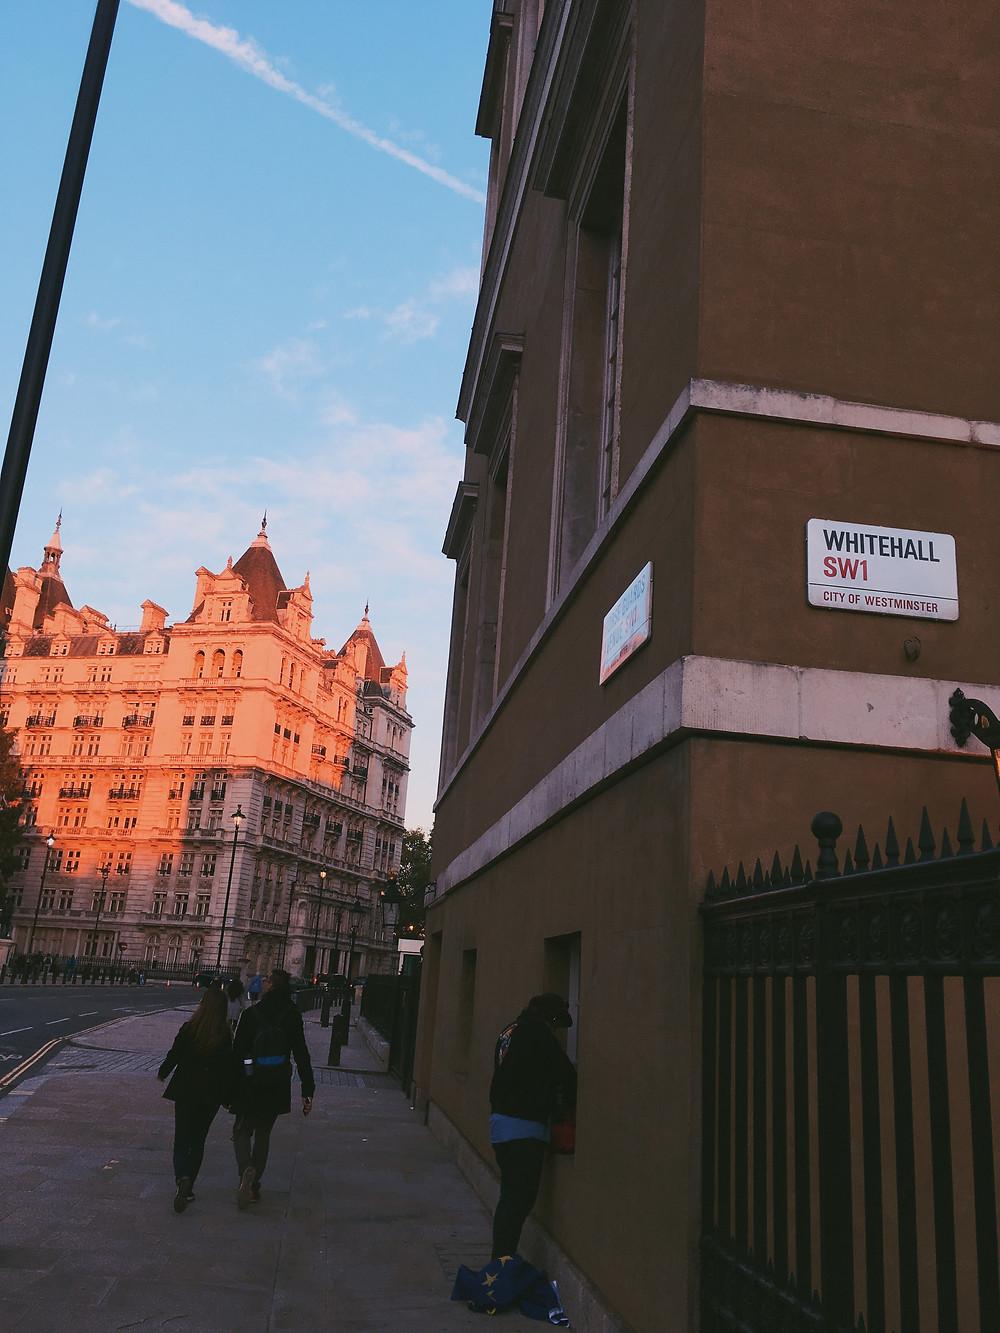 Calming sunset on Whitehall SW1 street sign